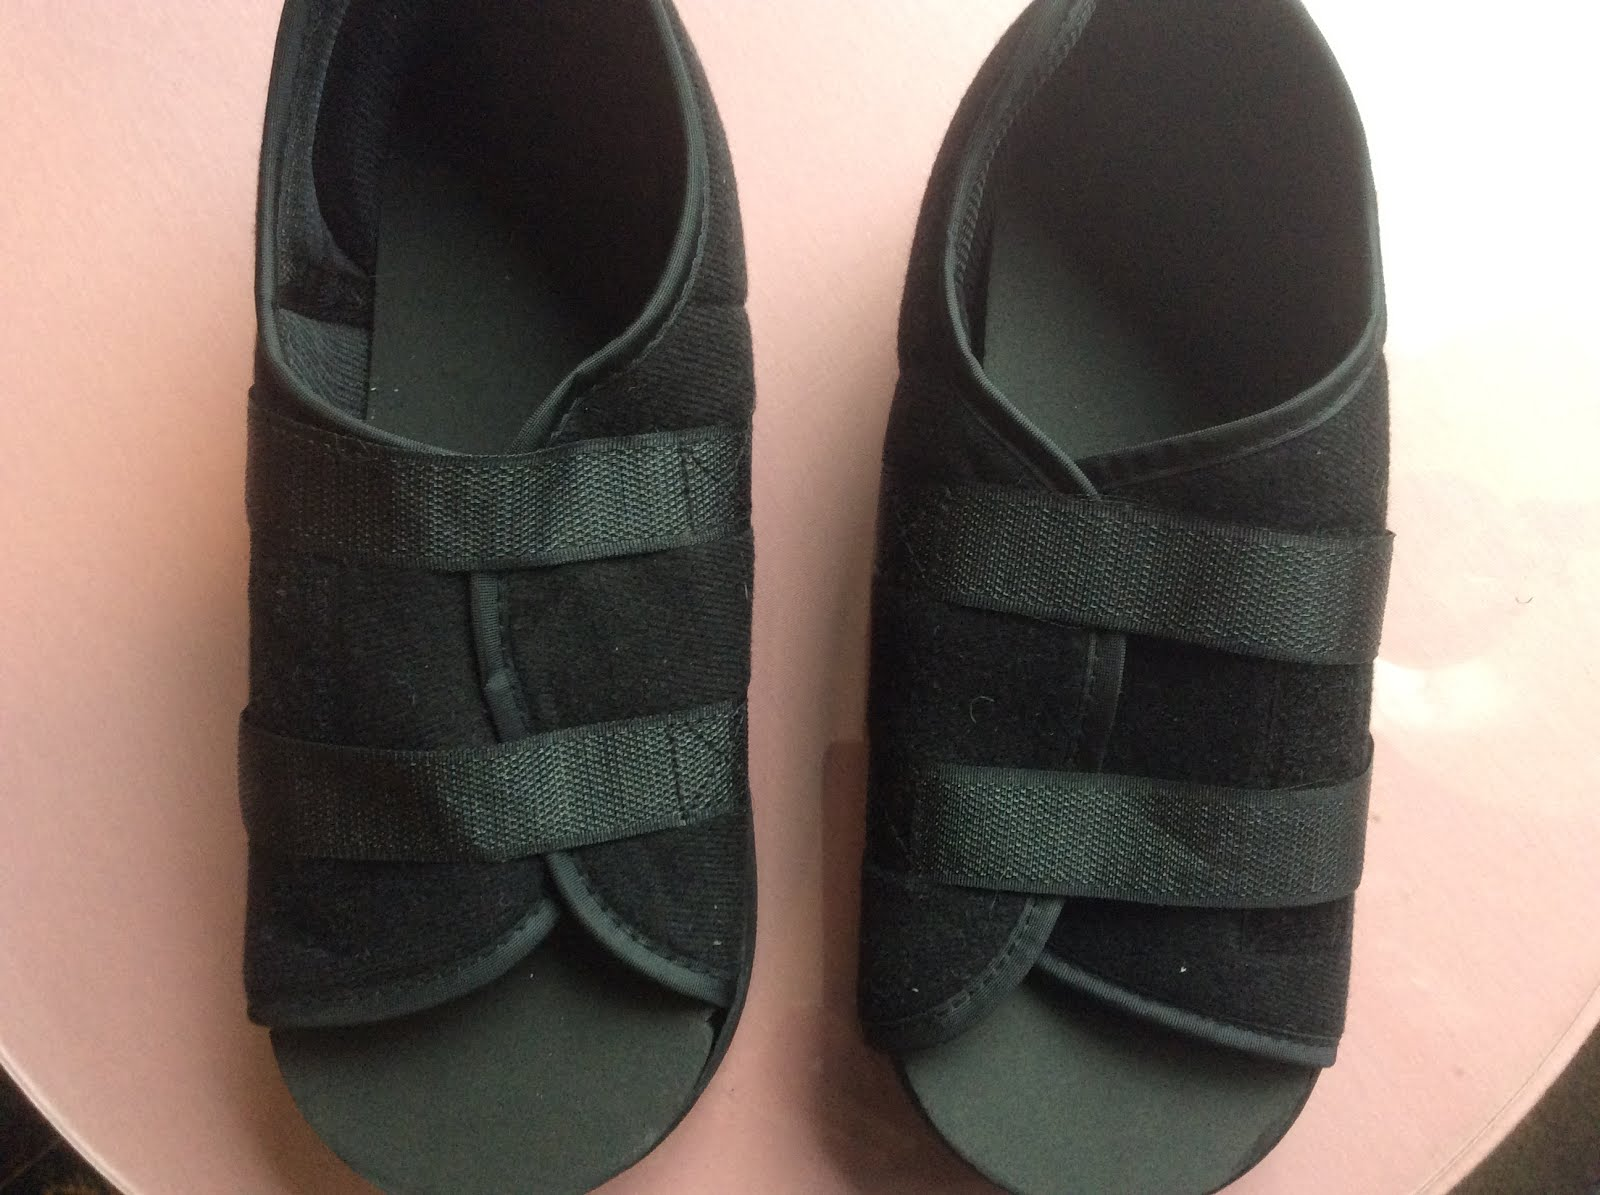 Biomagnetism shoes for sale $45